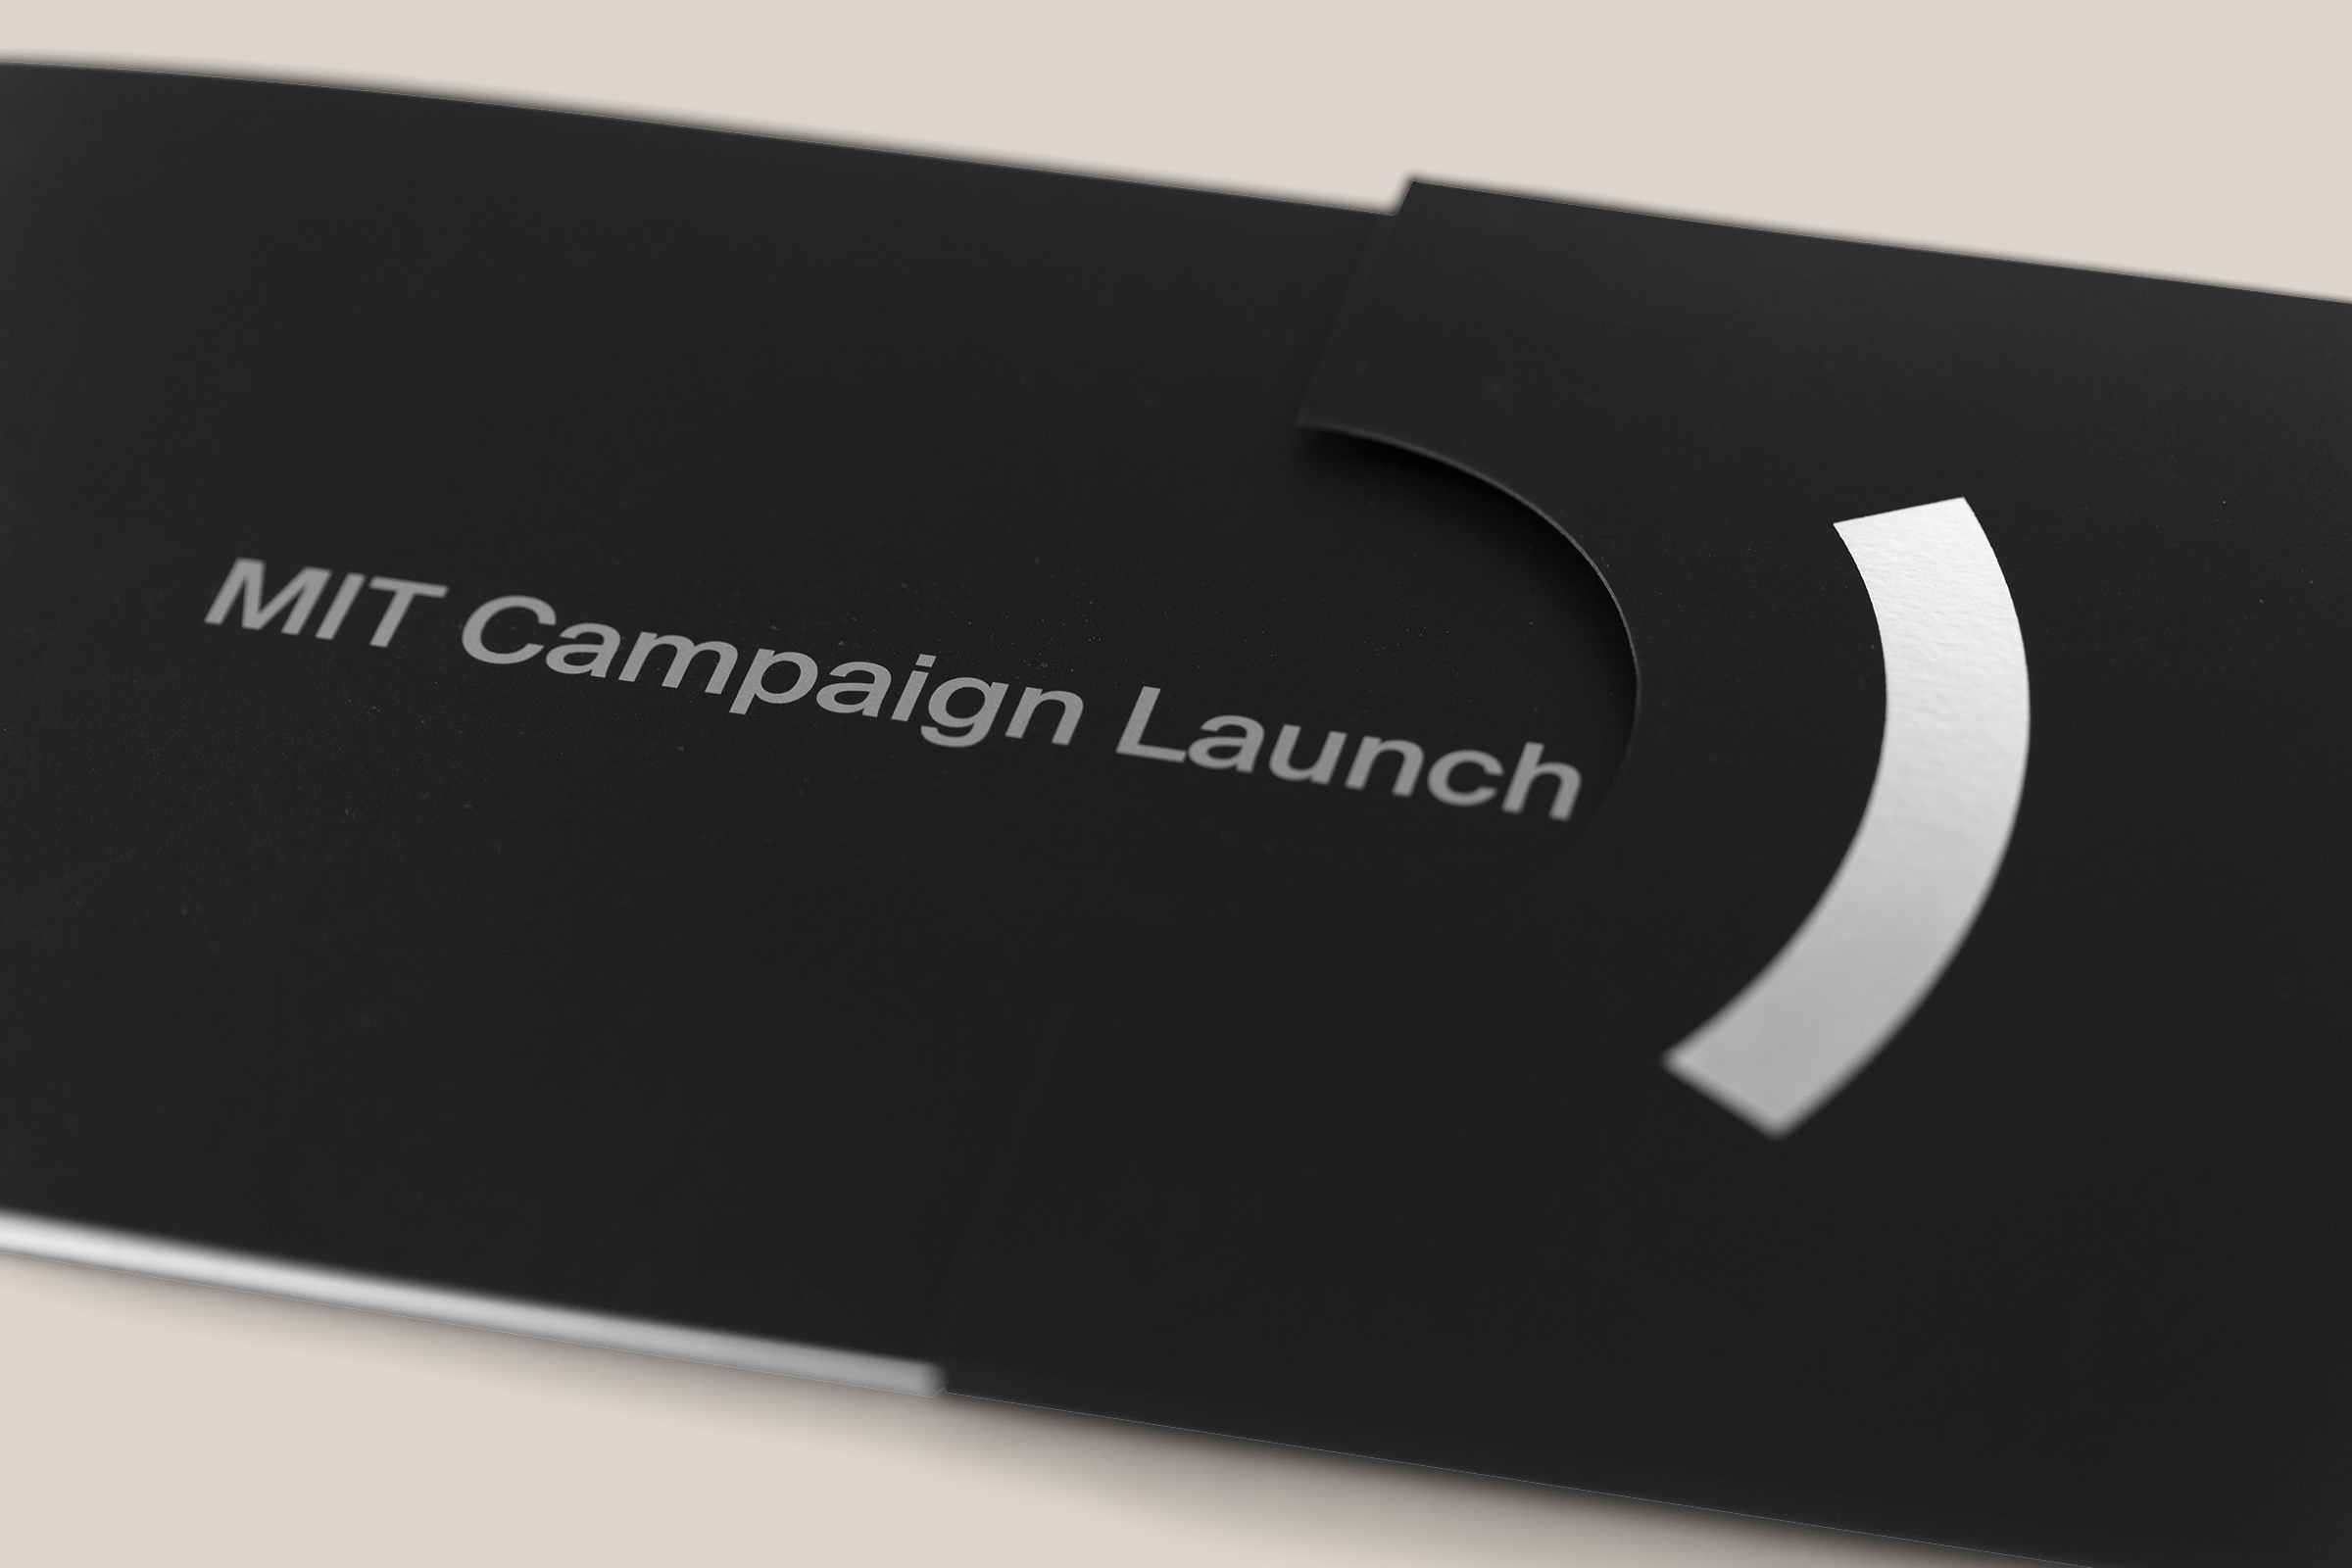 mit-campaign-launch-03